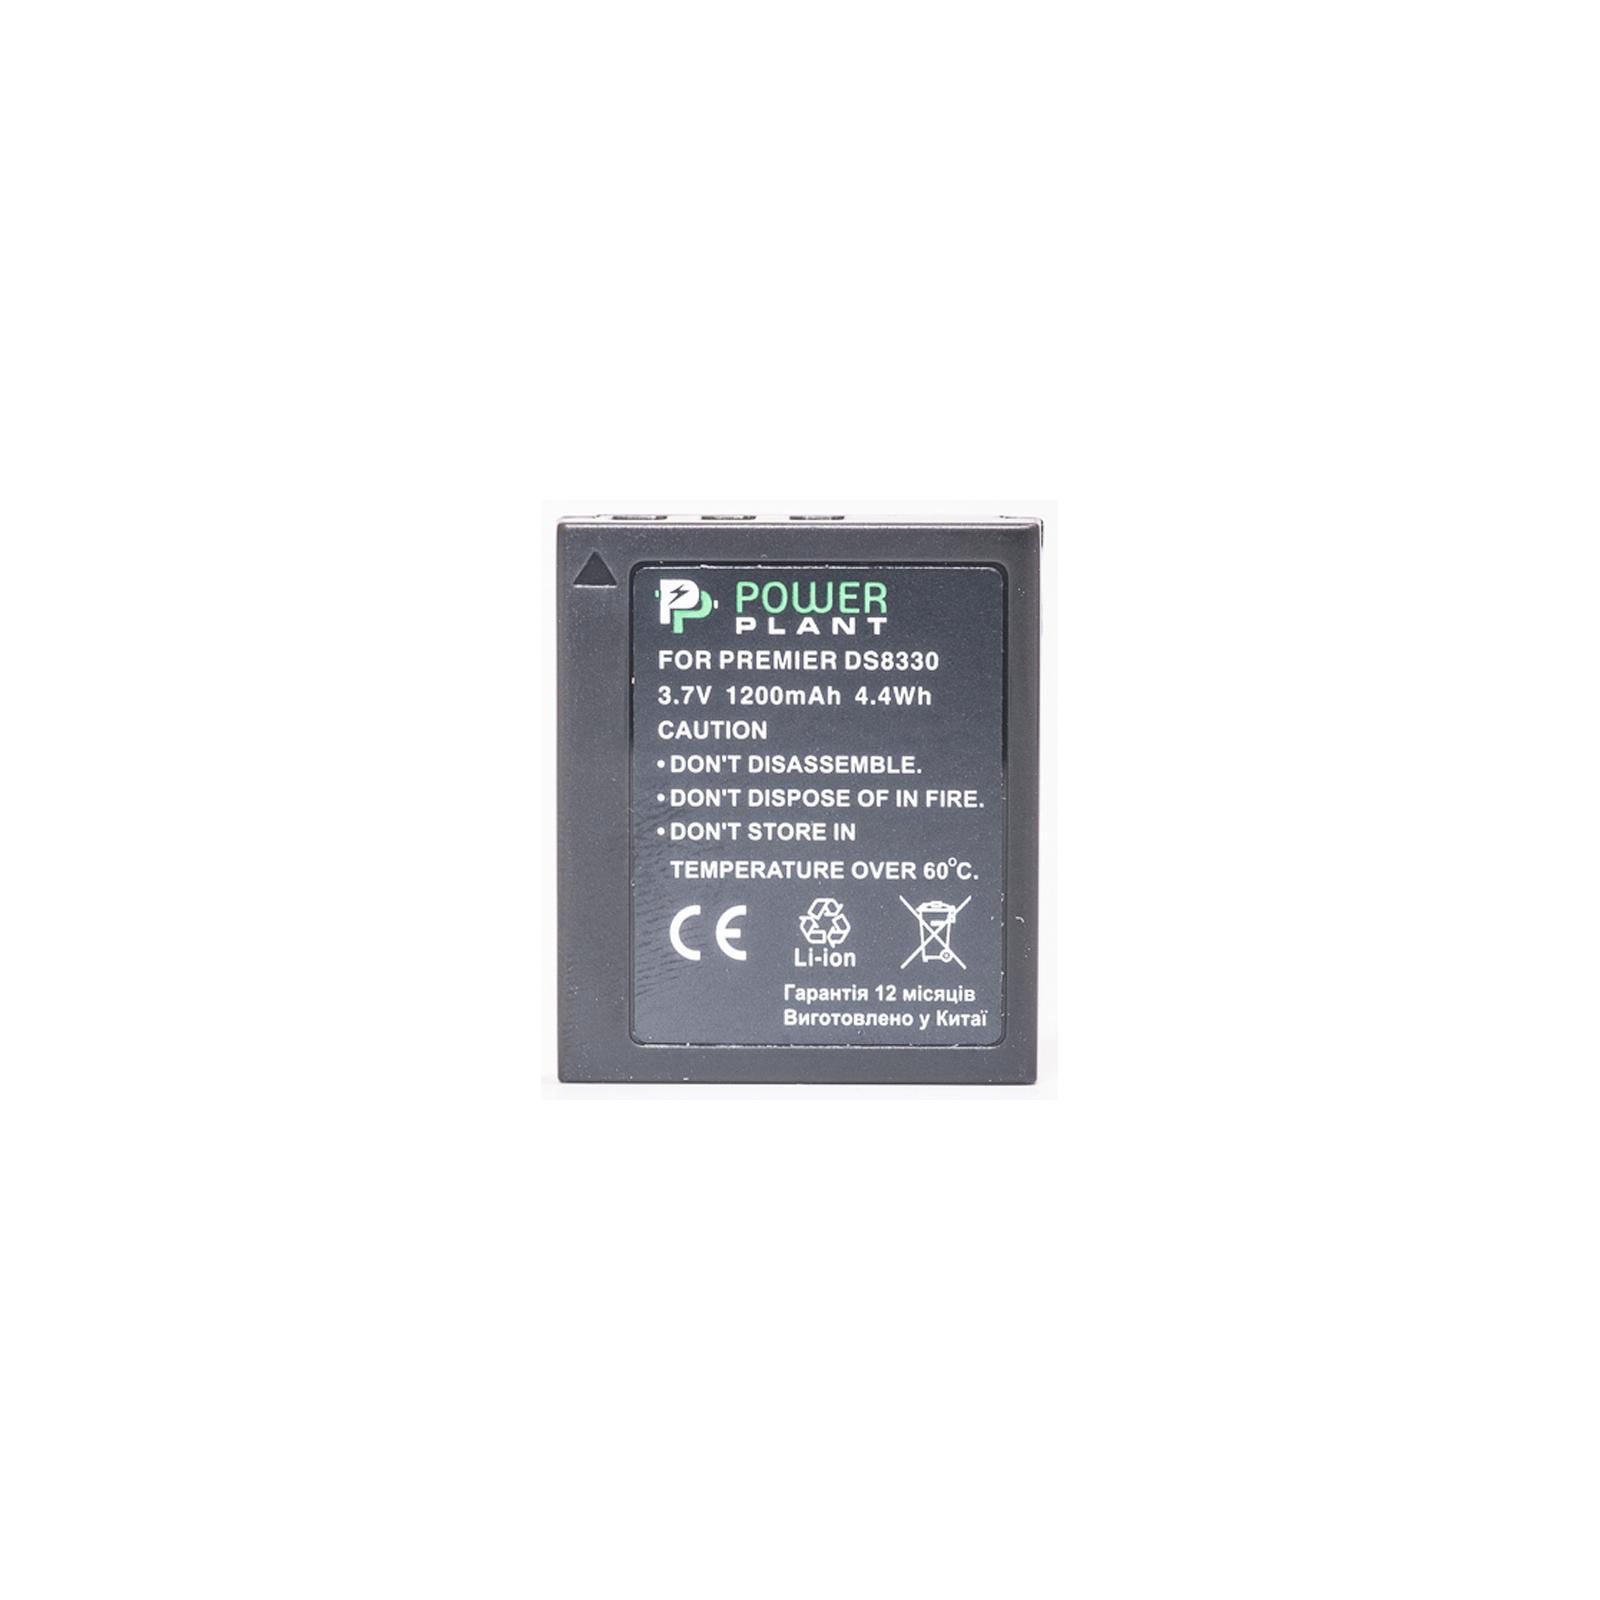 Аккумулятор к фото/видео PowerPlant UFO DS-8330 (DV00DV1252) изображение 2